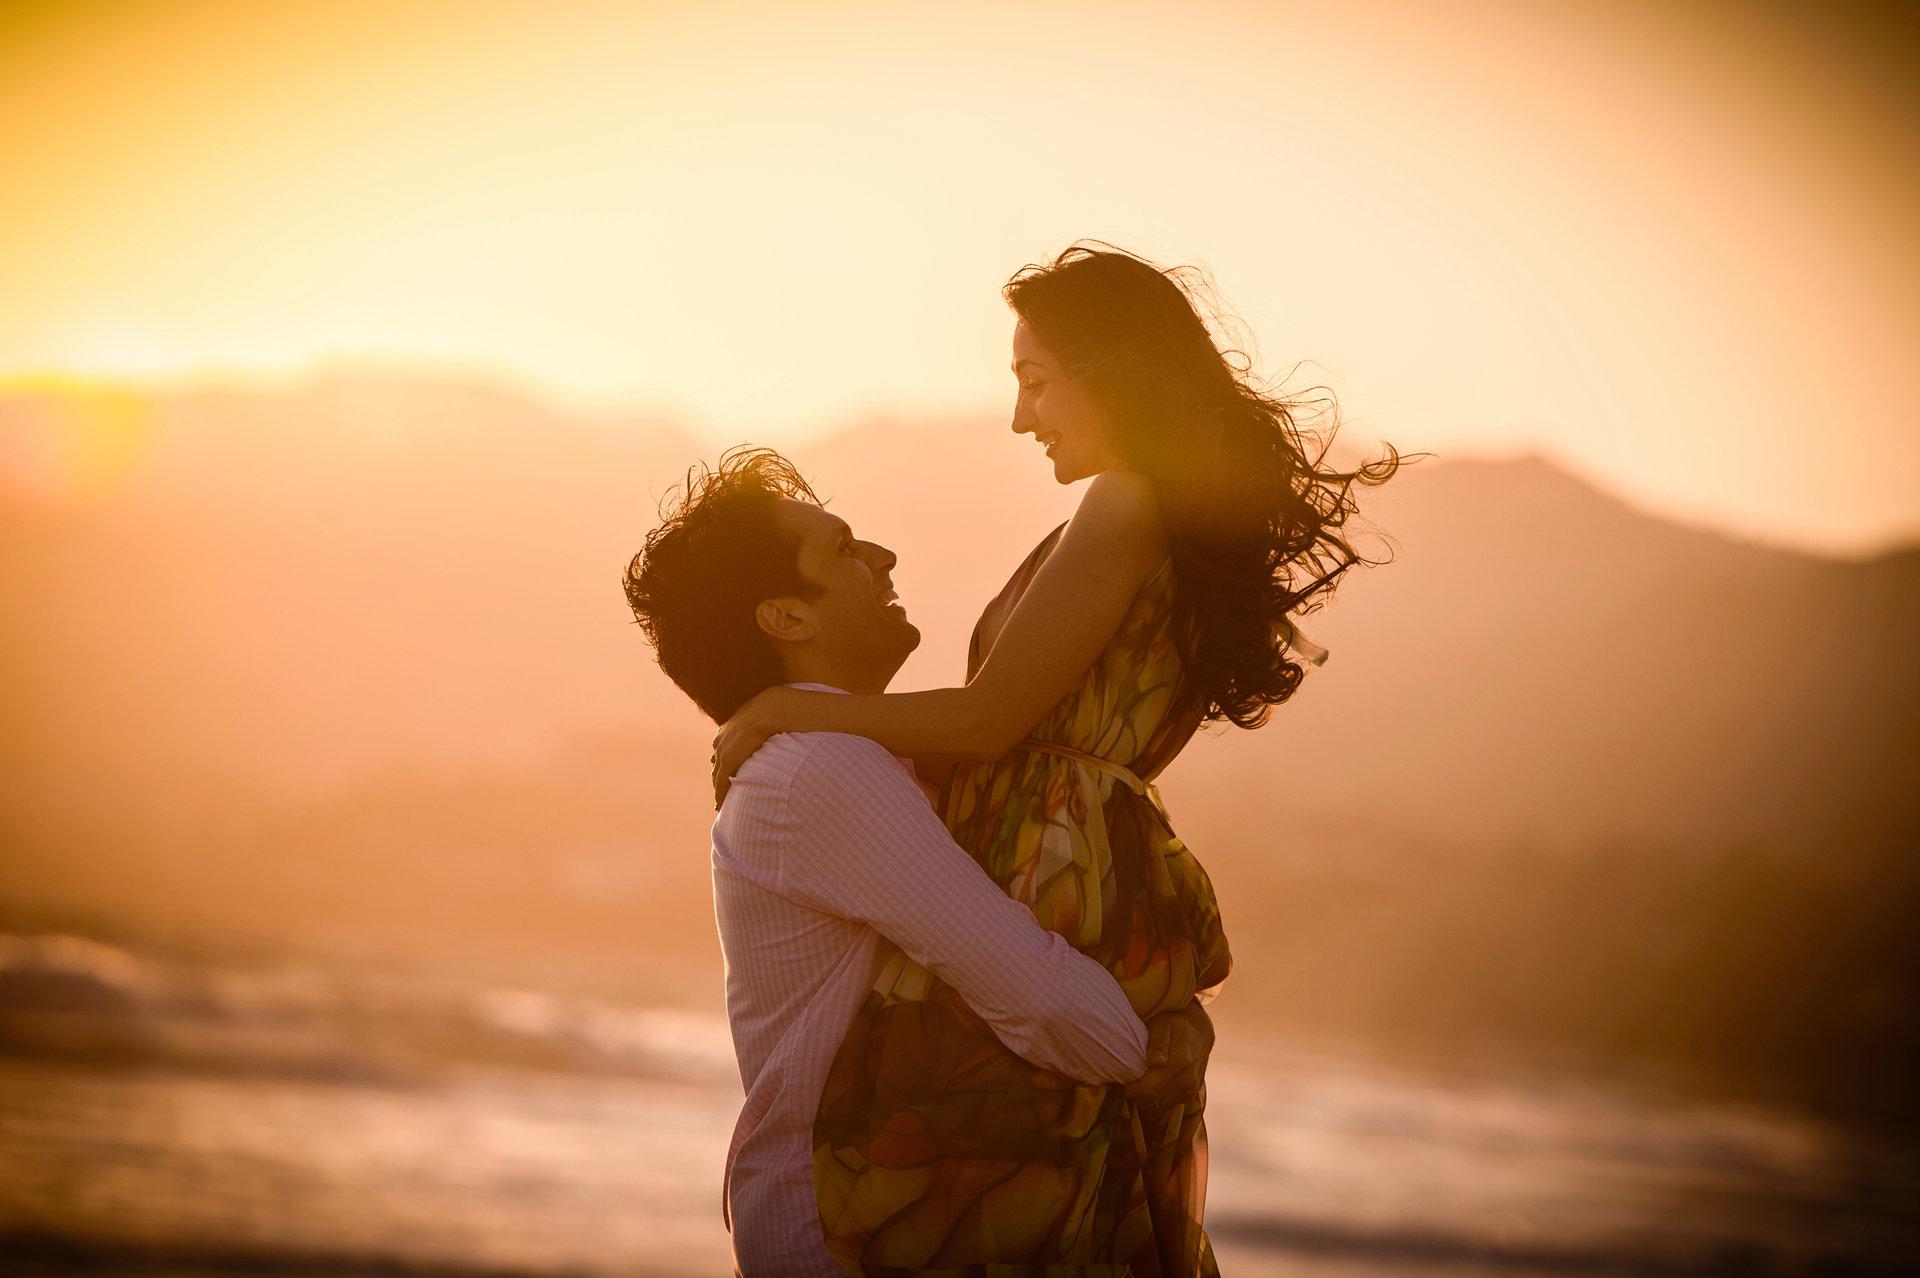 Los Angeles San Francisco Wedding engagement Photographer Tommy Xing 美国洛杉矶旧金山婚礼婚纱照摄影师